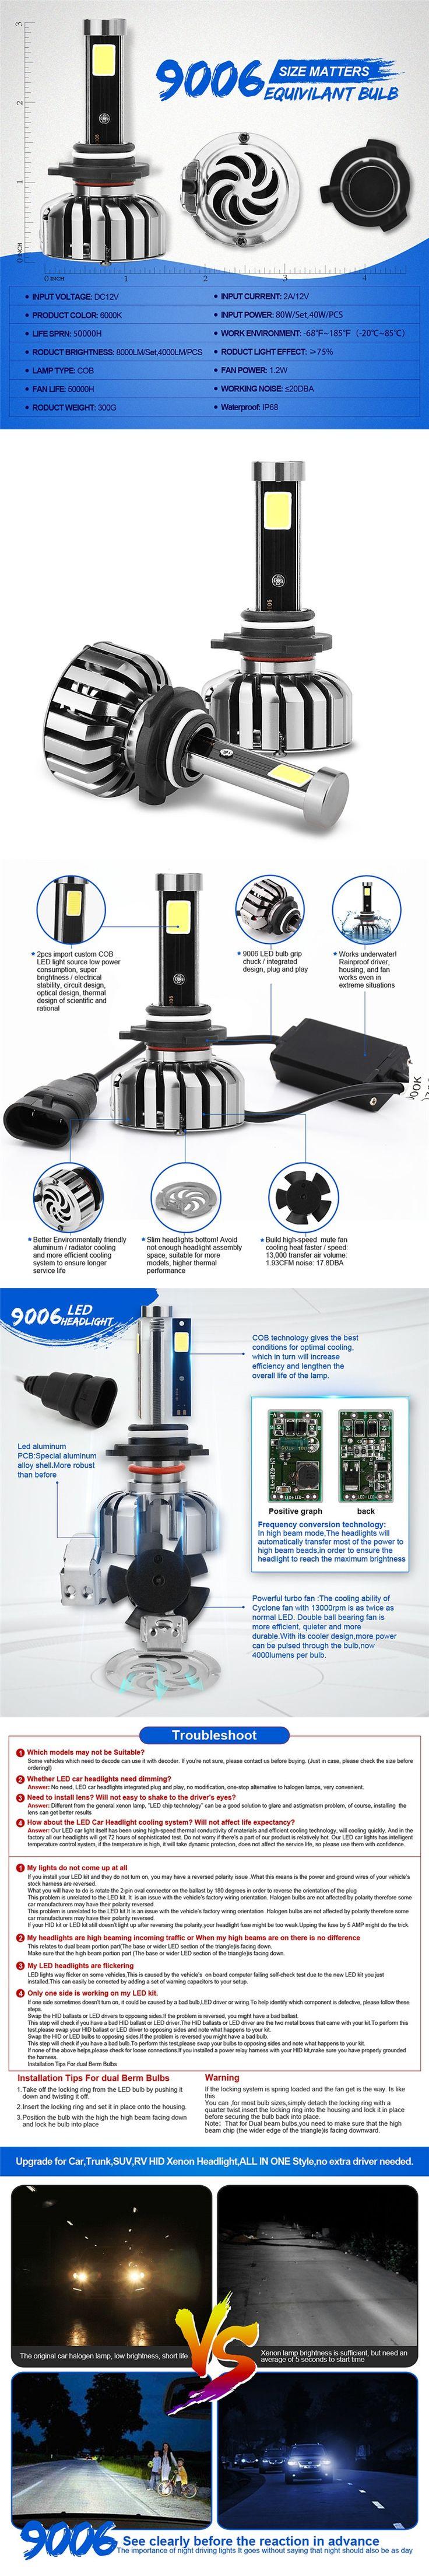 Hot Sale 9006 LED Car Headlights 6000K 12V Auto Bulbs Fog Lamp 80W 8000LM Cool White Light Source Car Bright Lighting